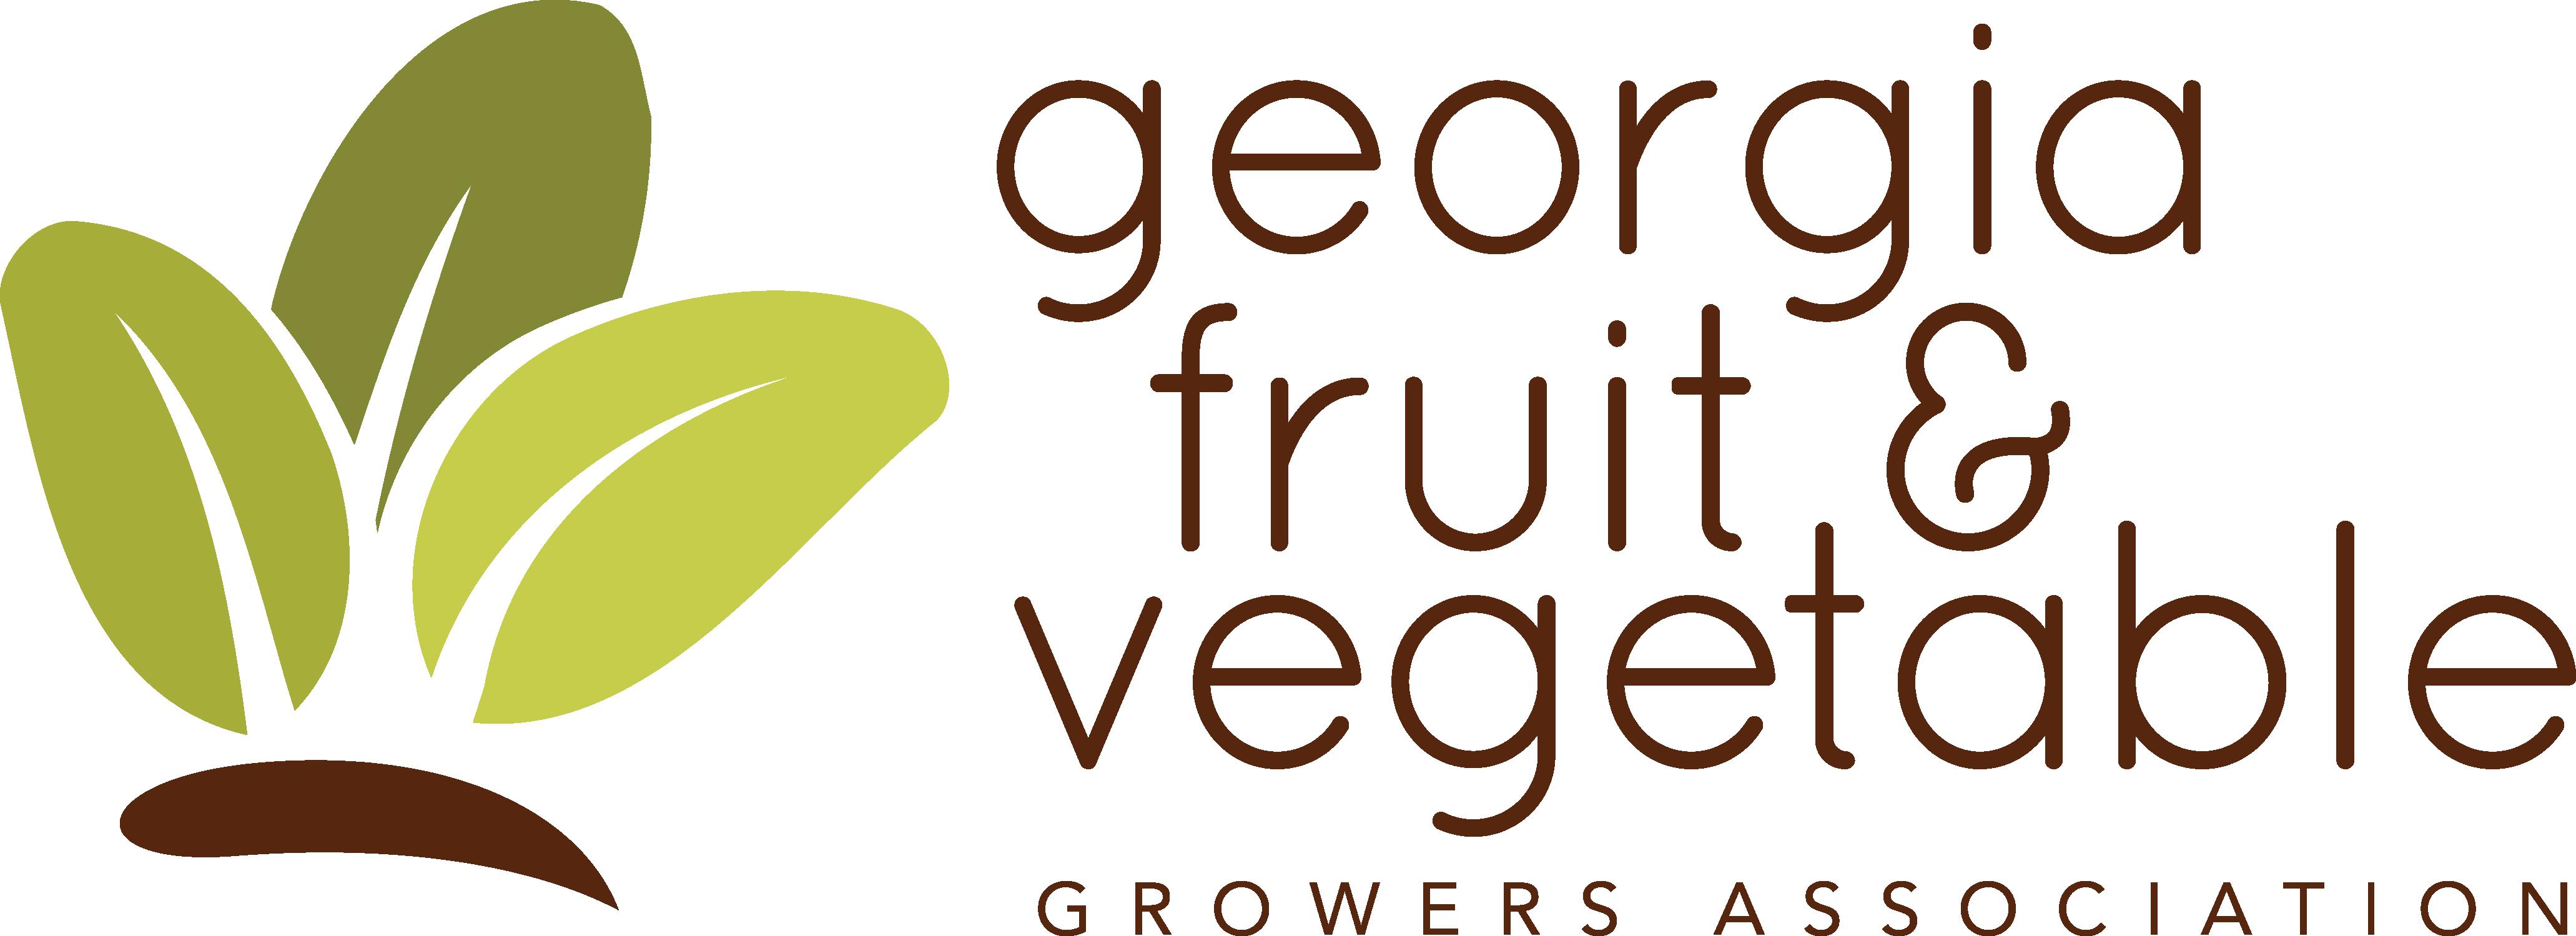 Milestones - Georgia Fruit and Vegetable Growers Association